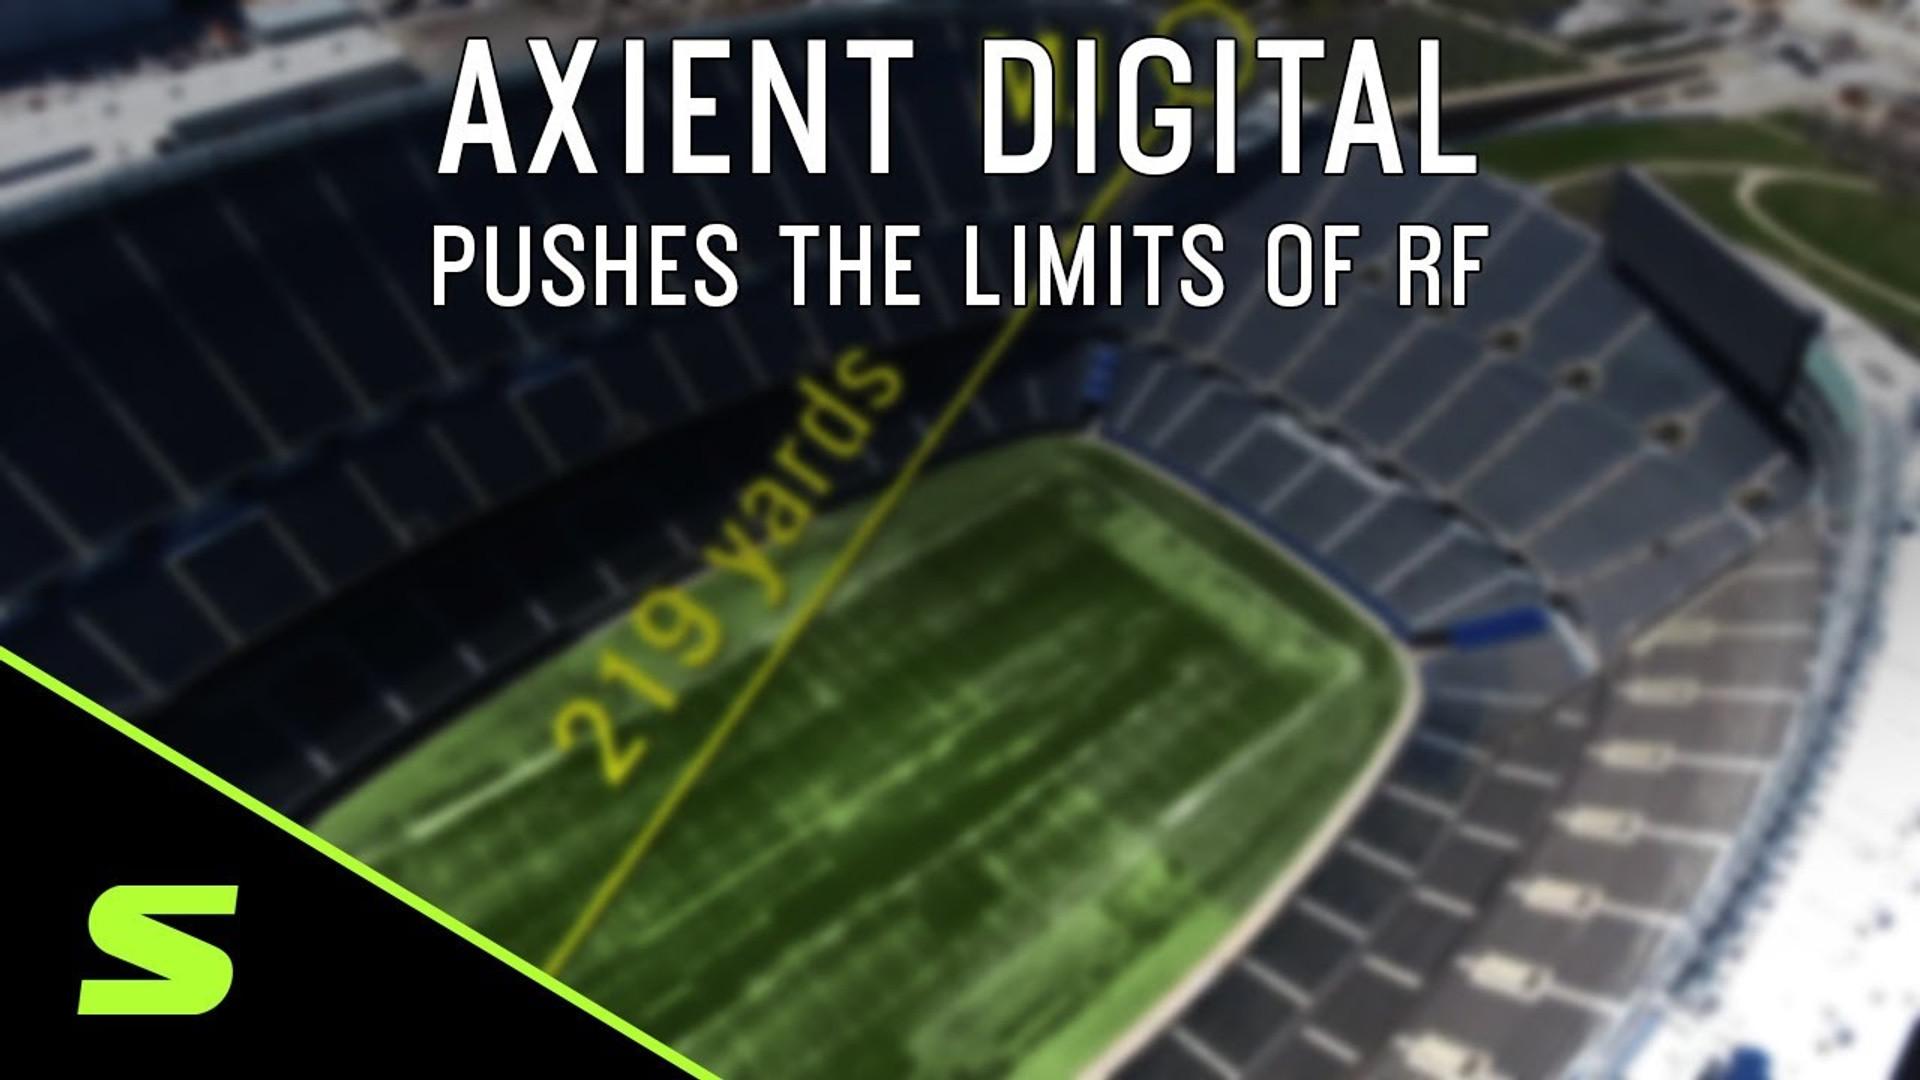 Axient Digital